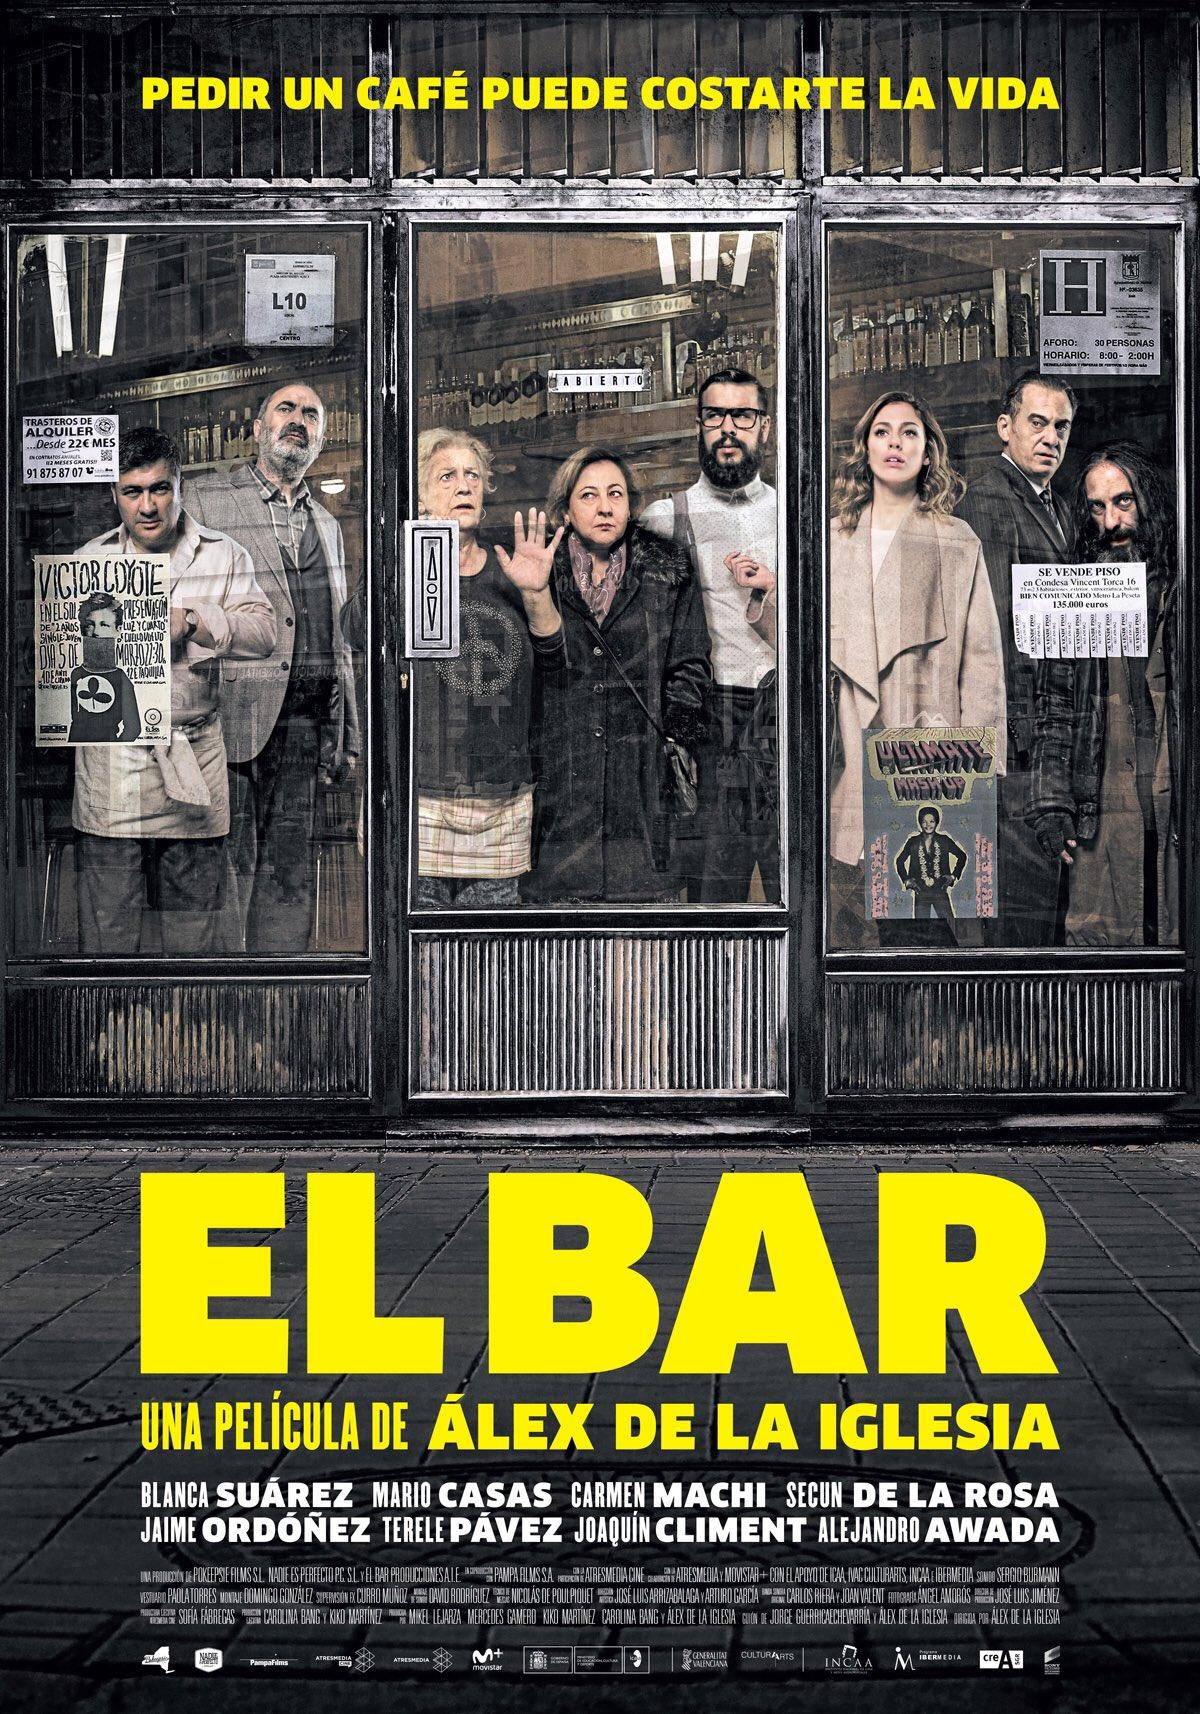 Increíble #elbarlapelicula de @alexdelaIglesia una película para pasar a la historia del #CineEspanol . Bravo 👏🏻👏🏻👏🏻👏🏻 PELICULÓN https://t.co/P4VlCMVwpq